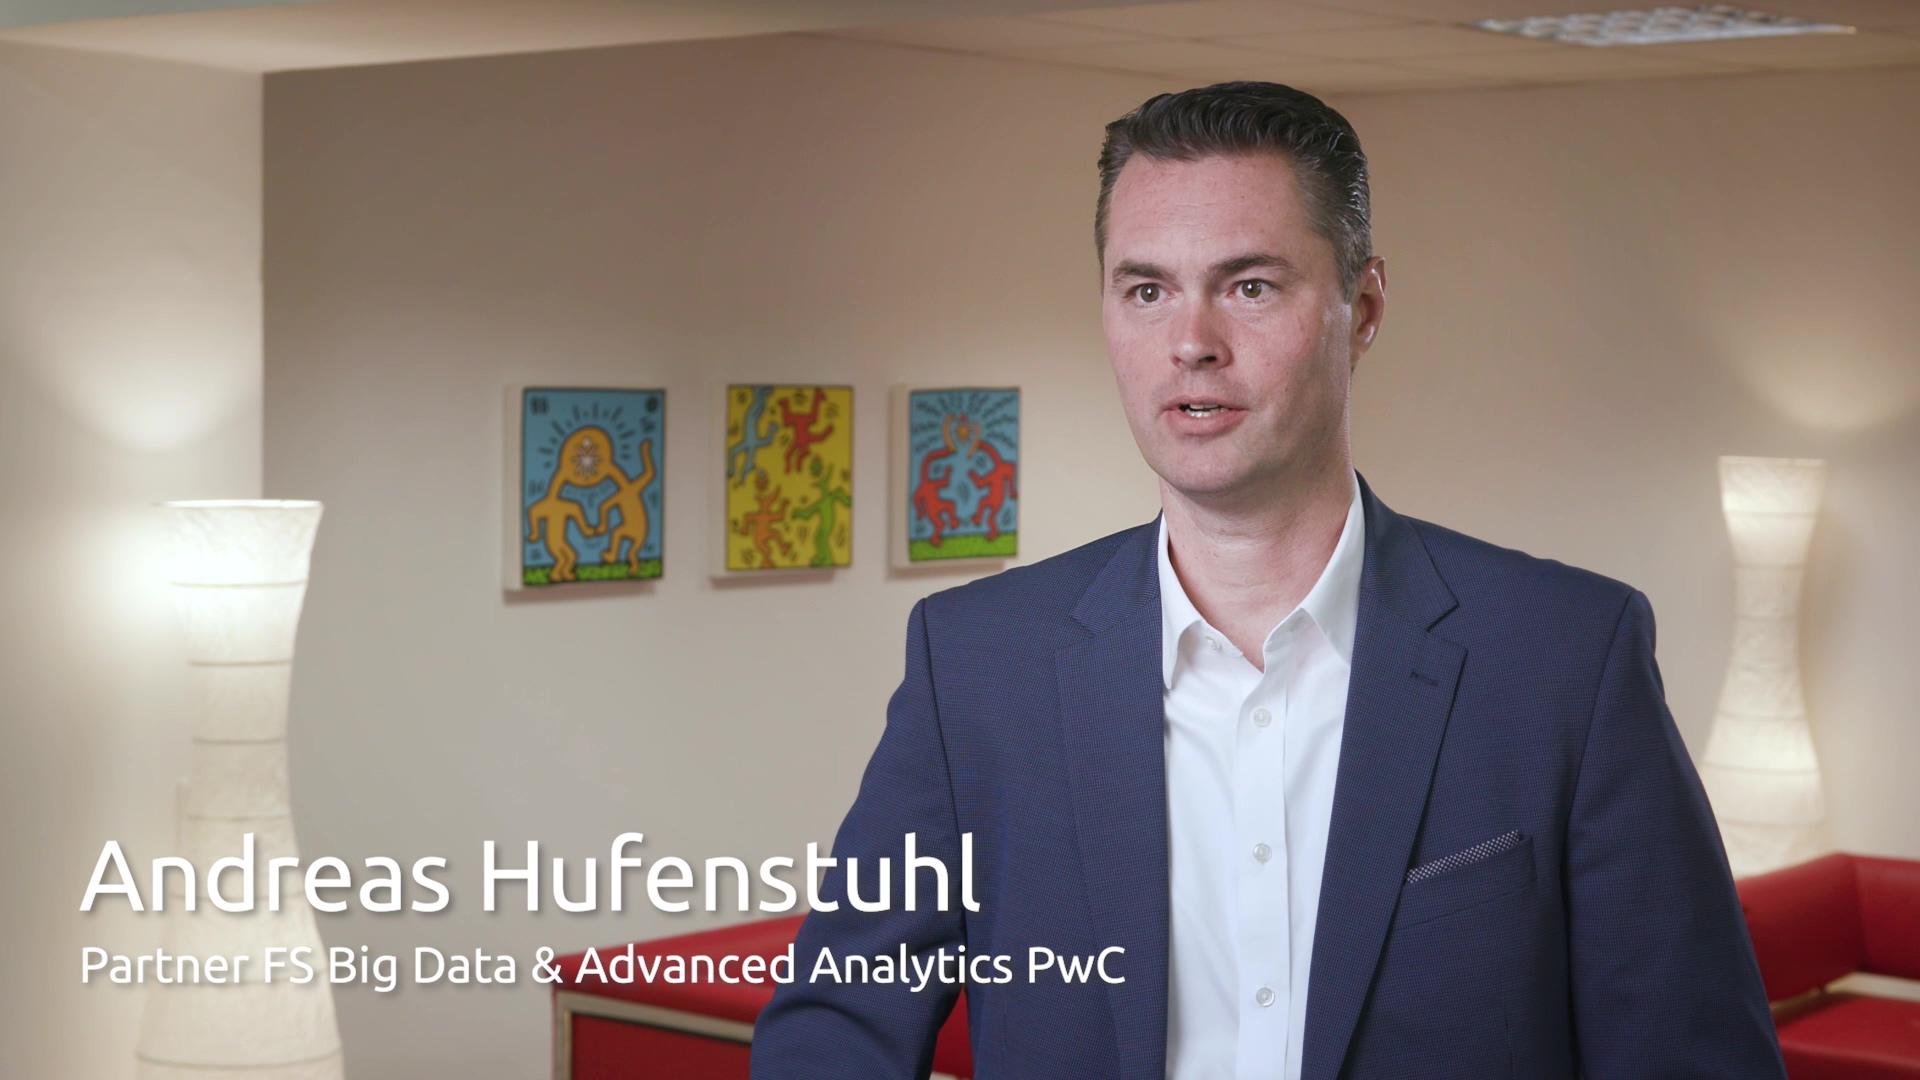 ThinkOwl Partner PwC Andreas Hufenstuhl